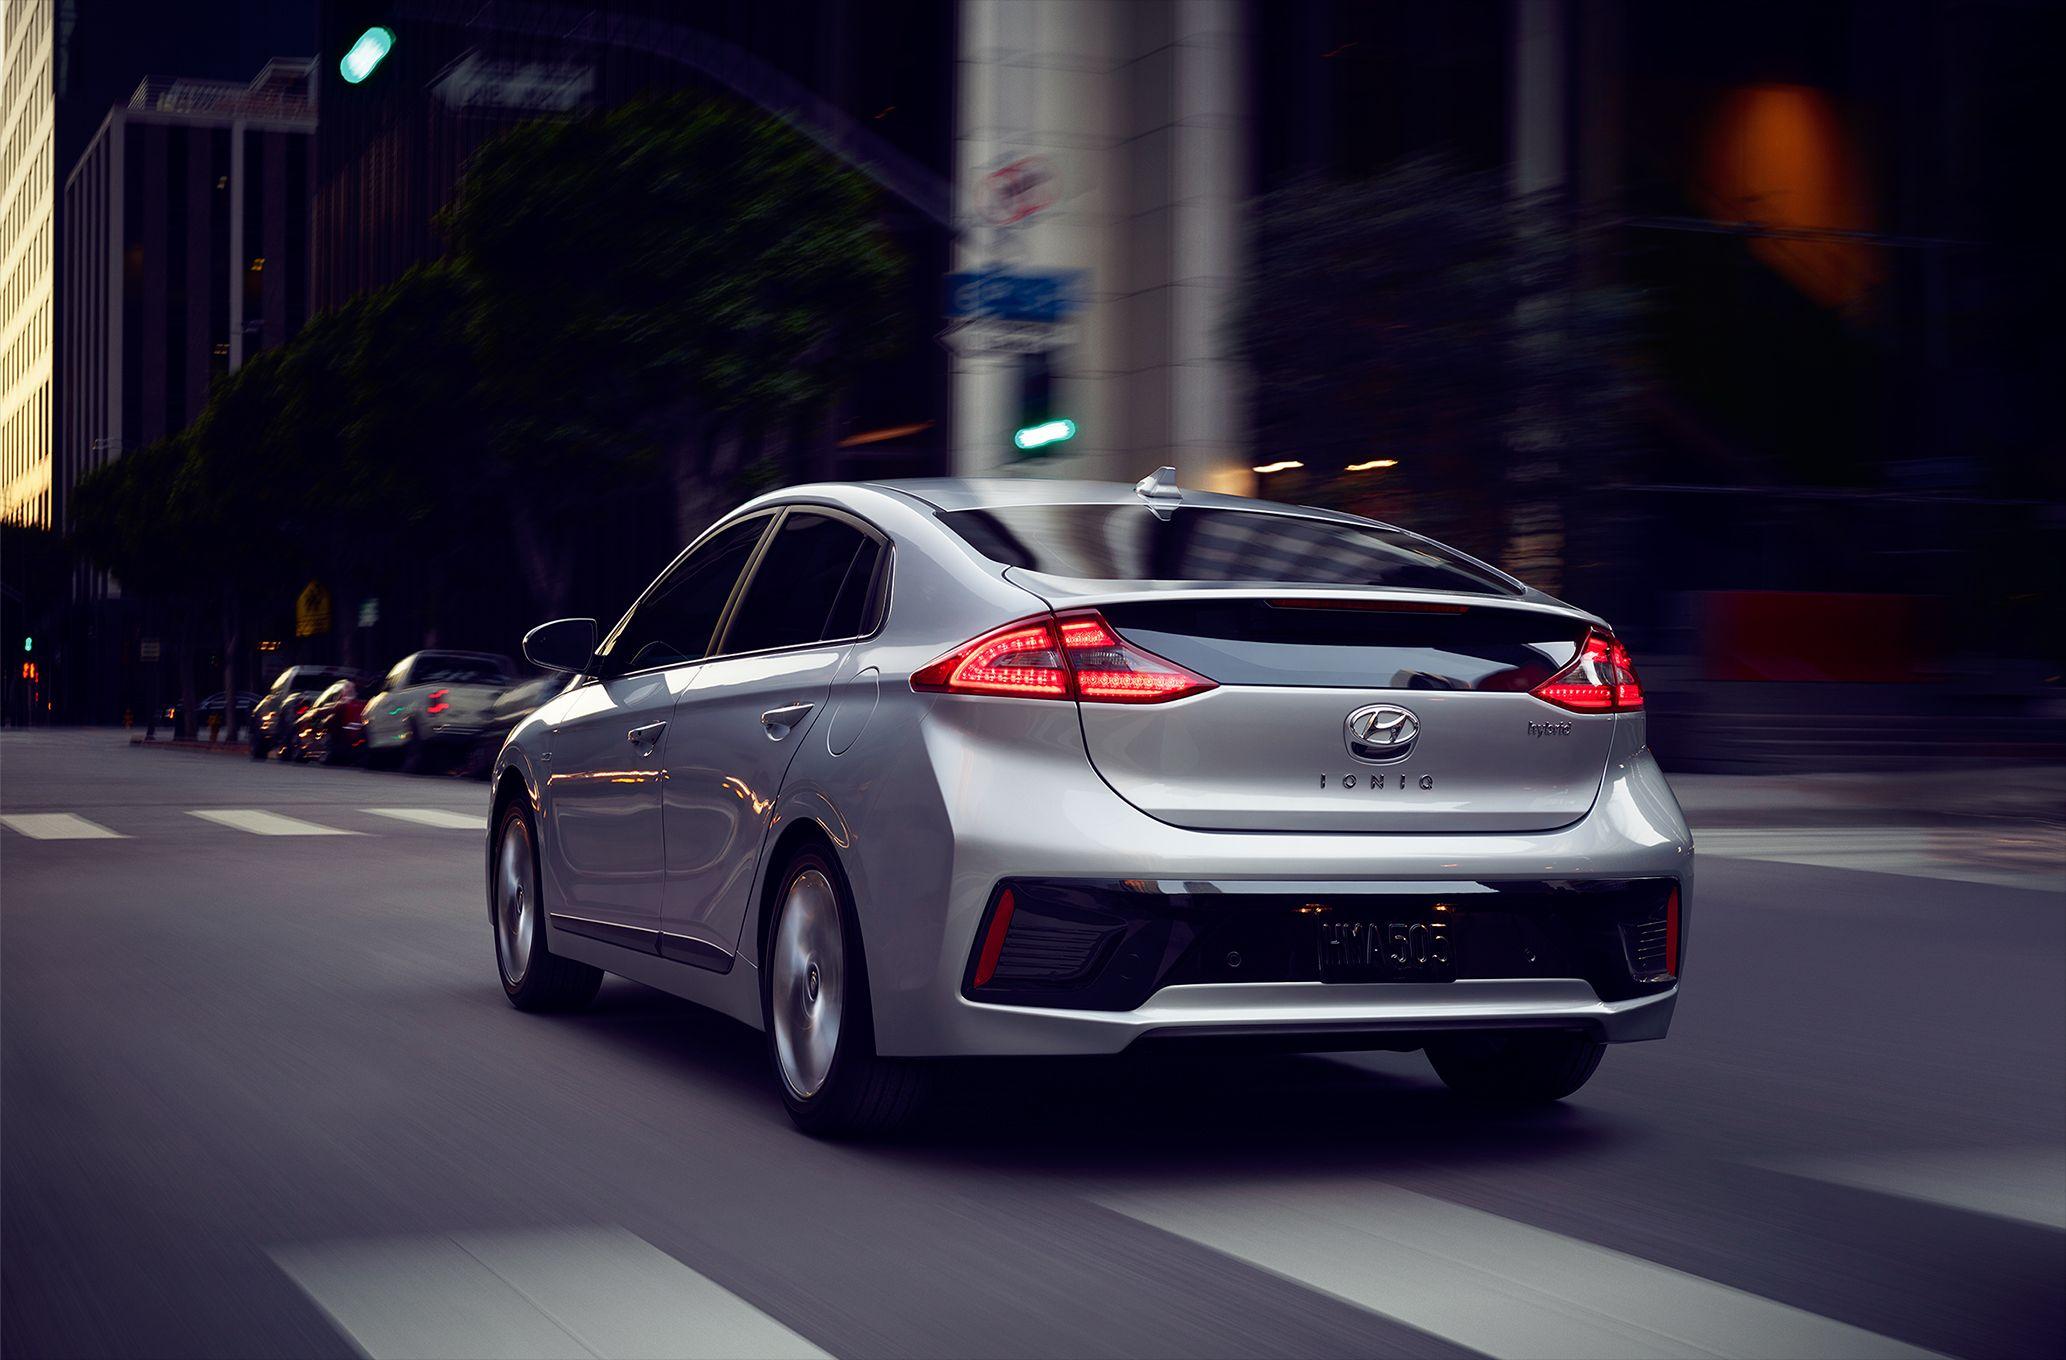 The 2017HyundaiIoniq will take you anywhere Hyundai